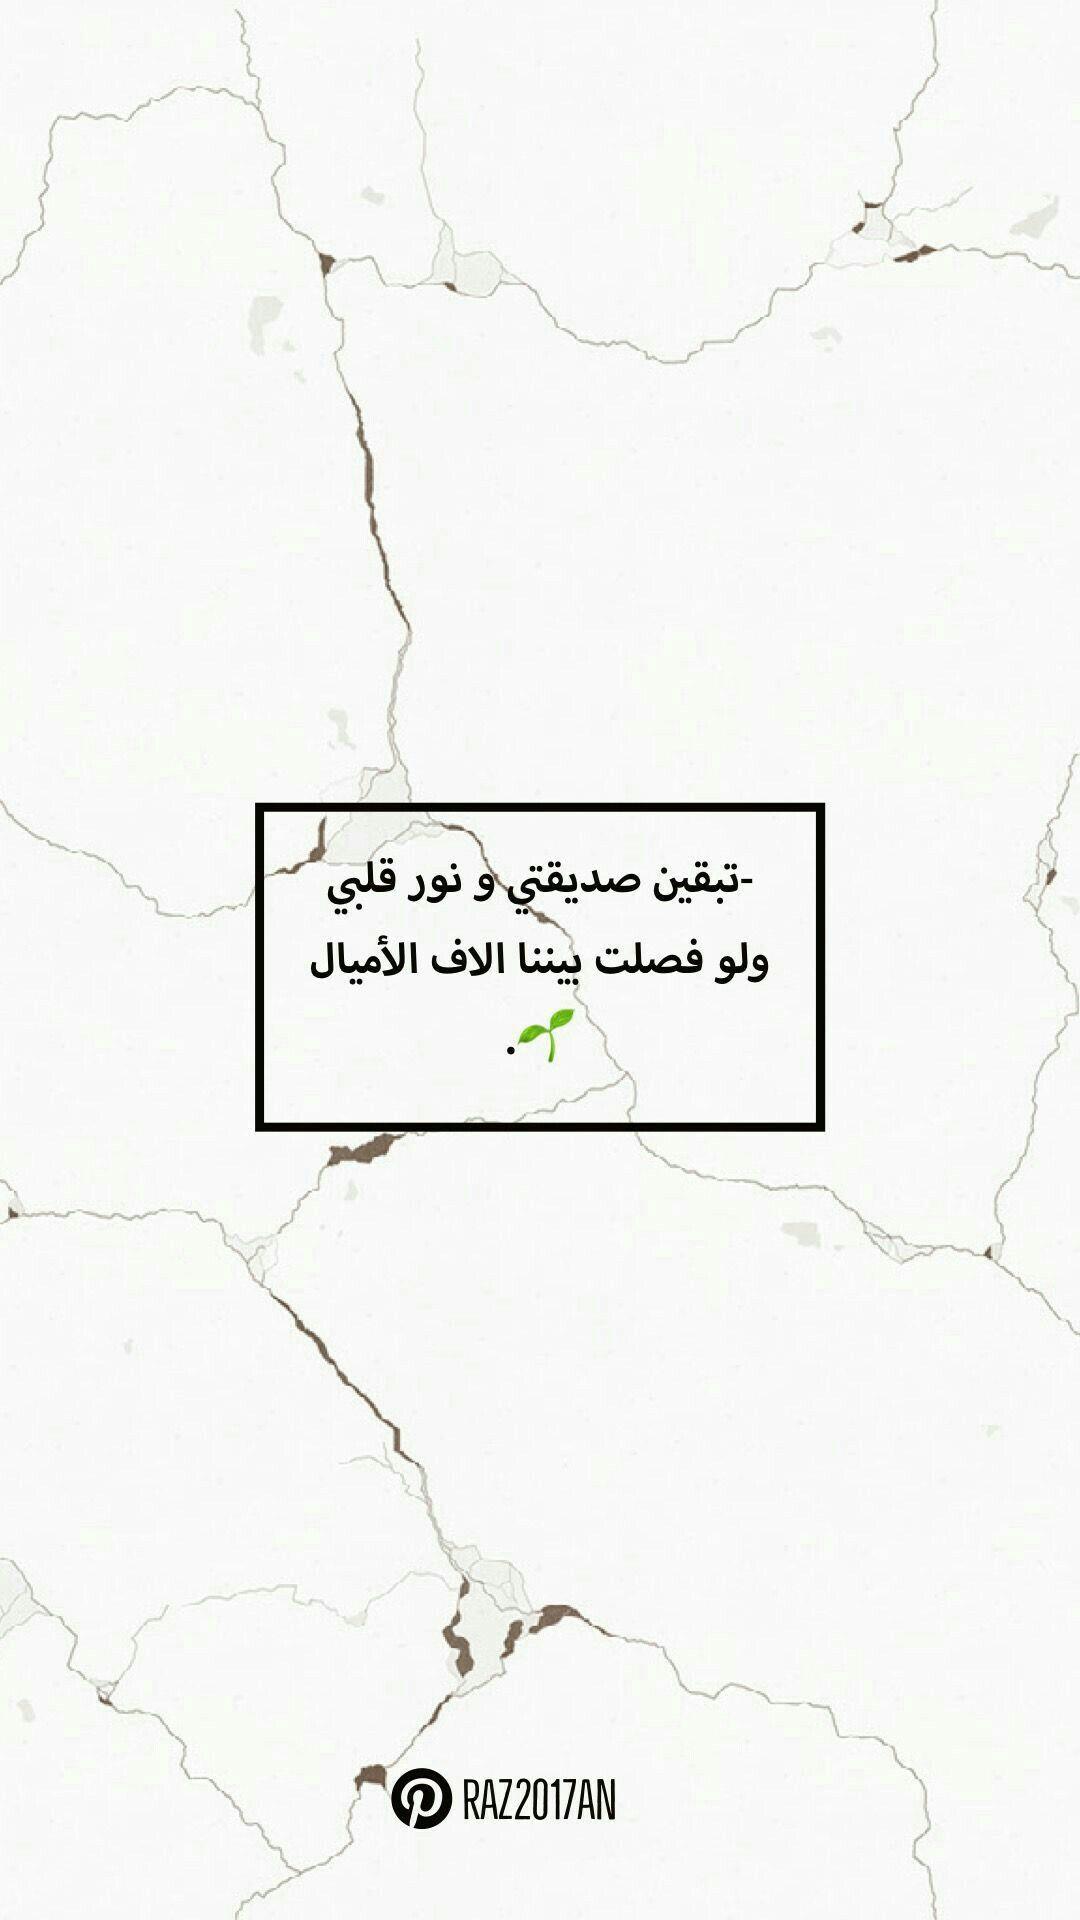 Pin By Mais Samhouri On الأصدقاء وطن Quotes Math Love You